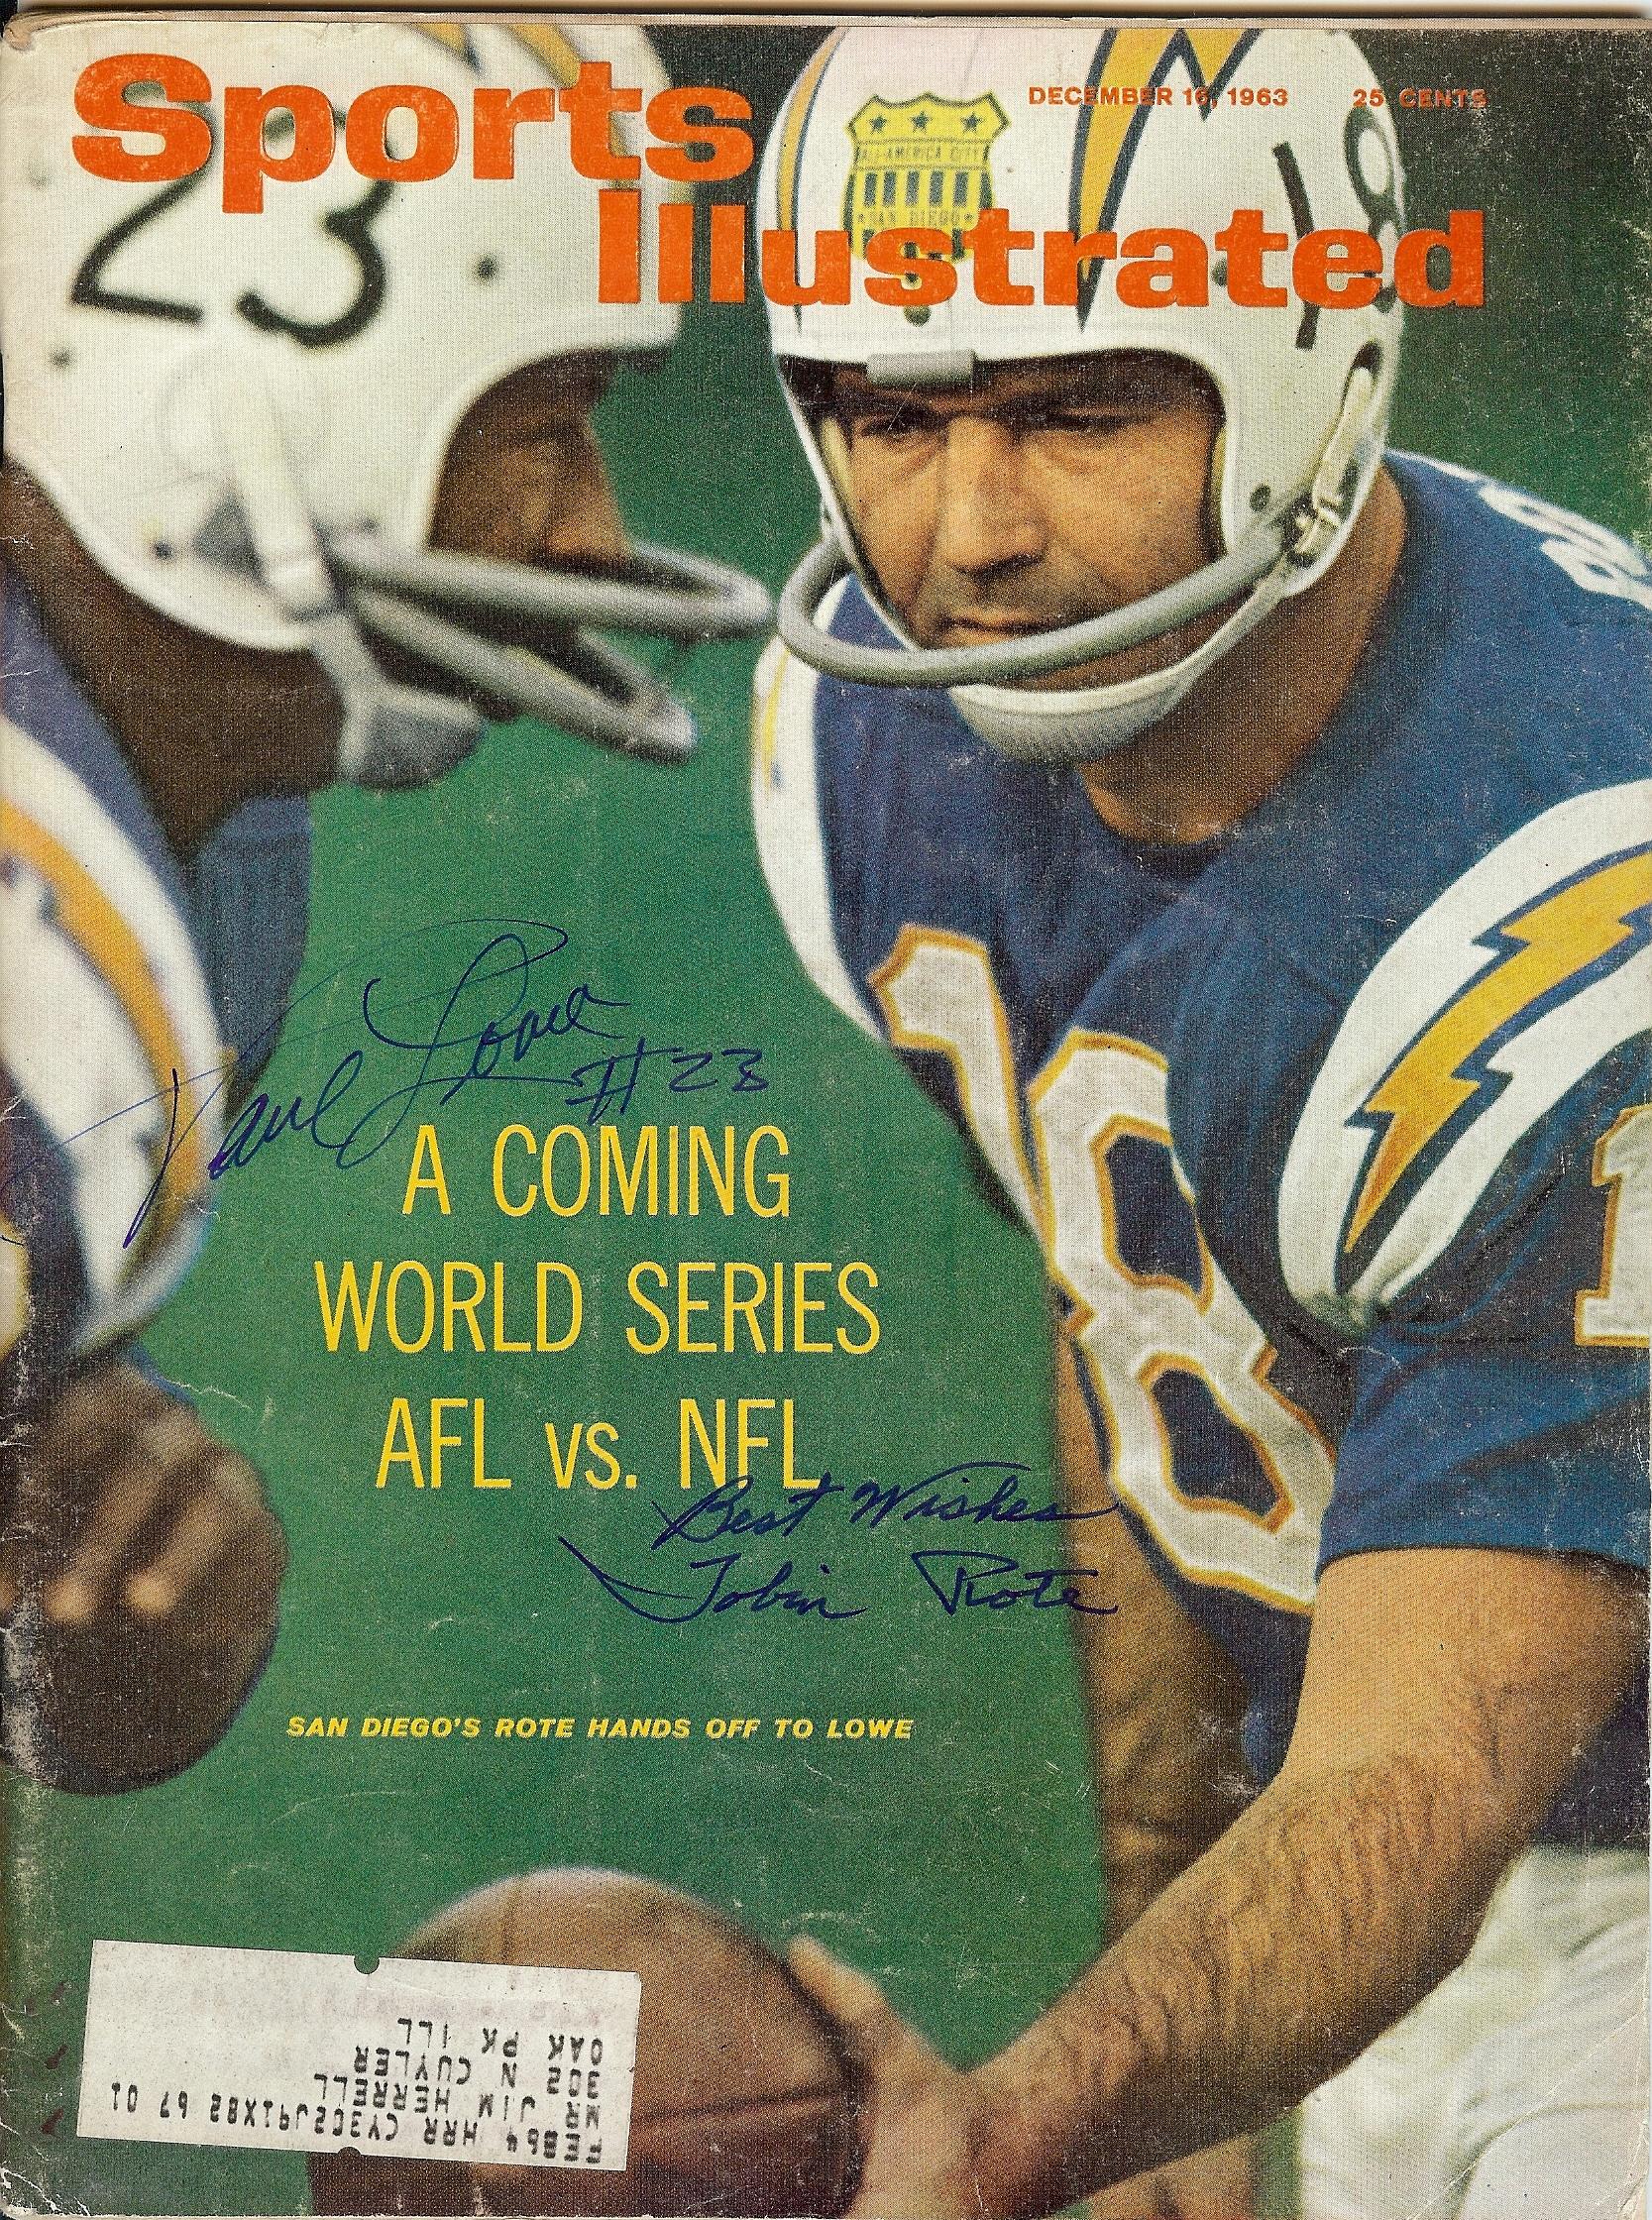 1963 sports illustrated